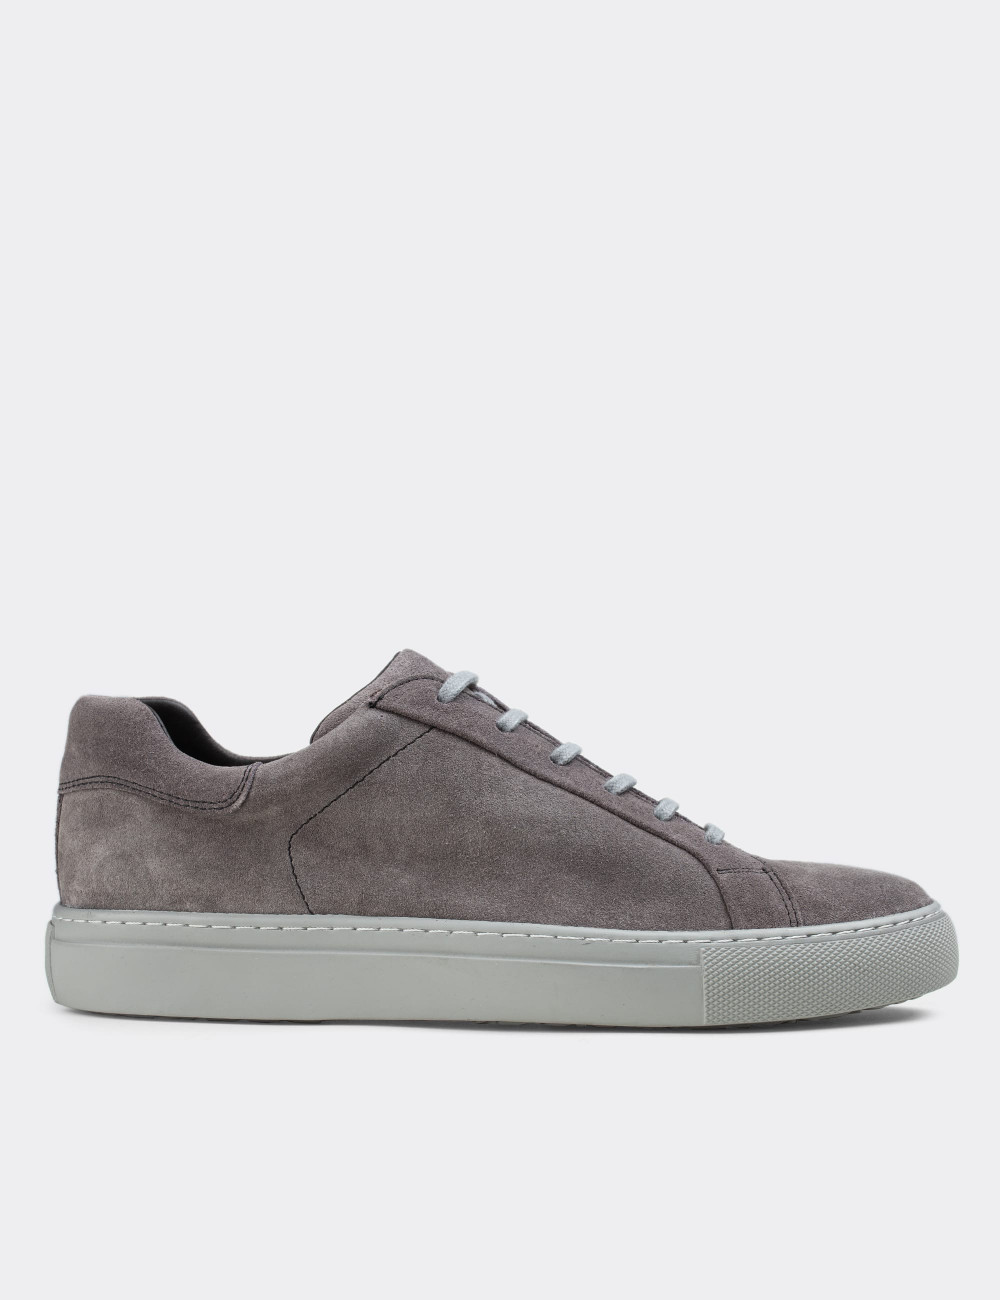 Hakiki Süet Gri Sneaker Erkek Ayakkabı - 01829MGRIC01